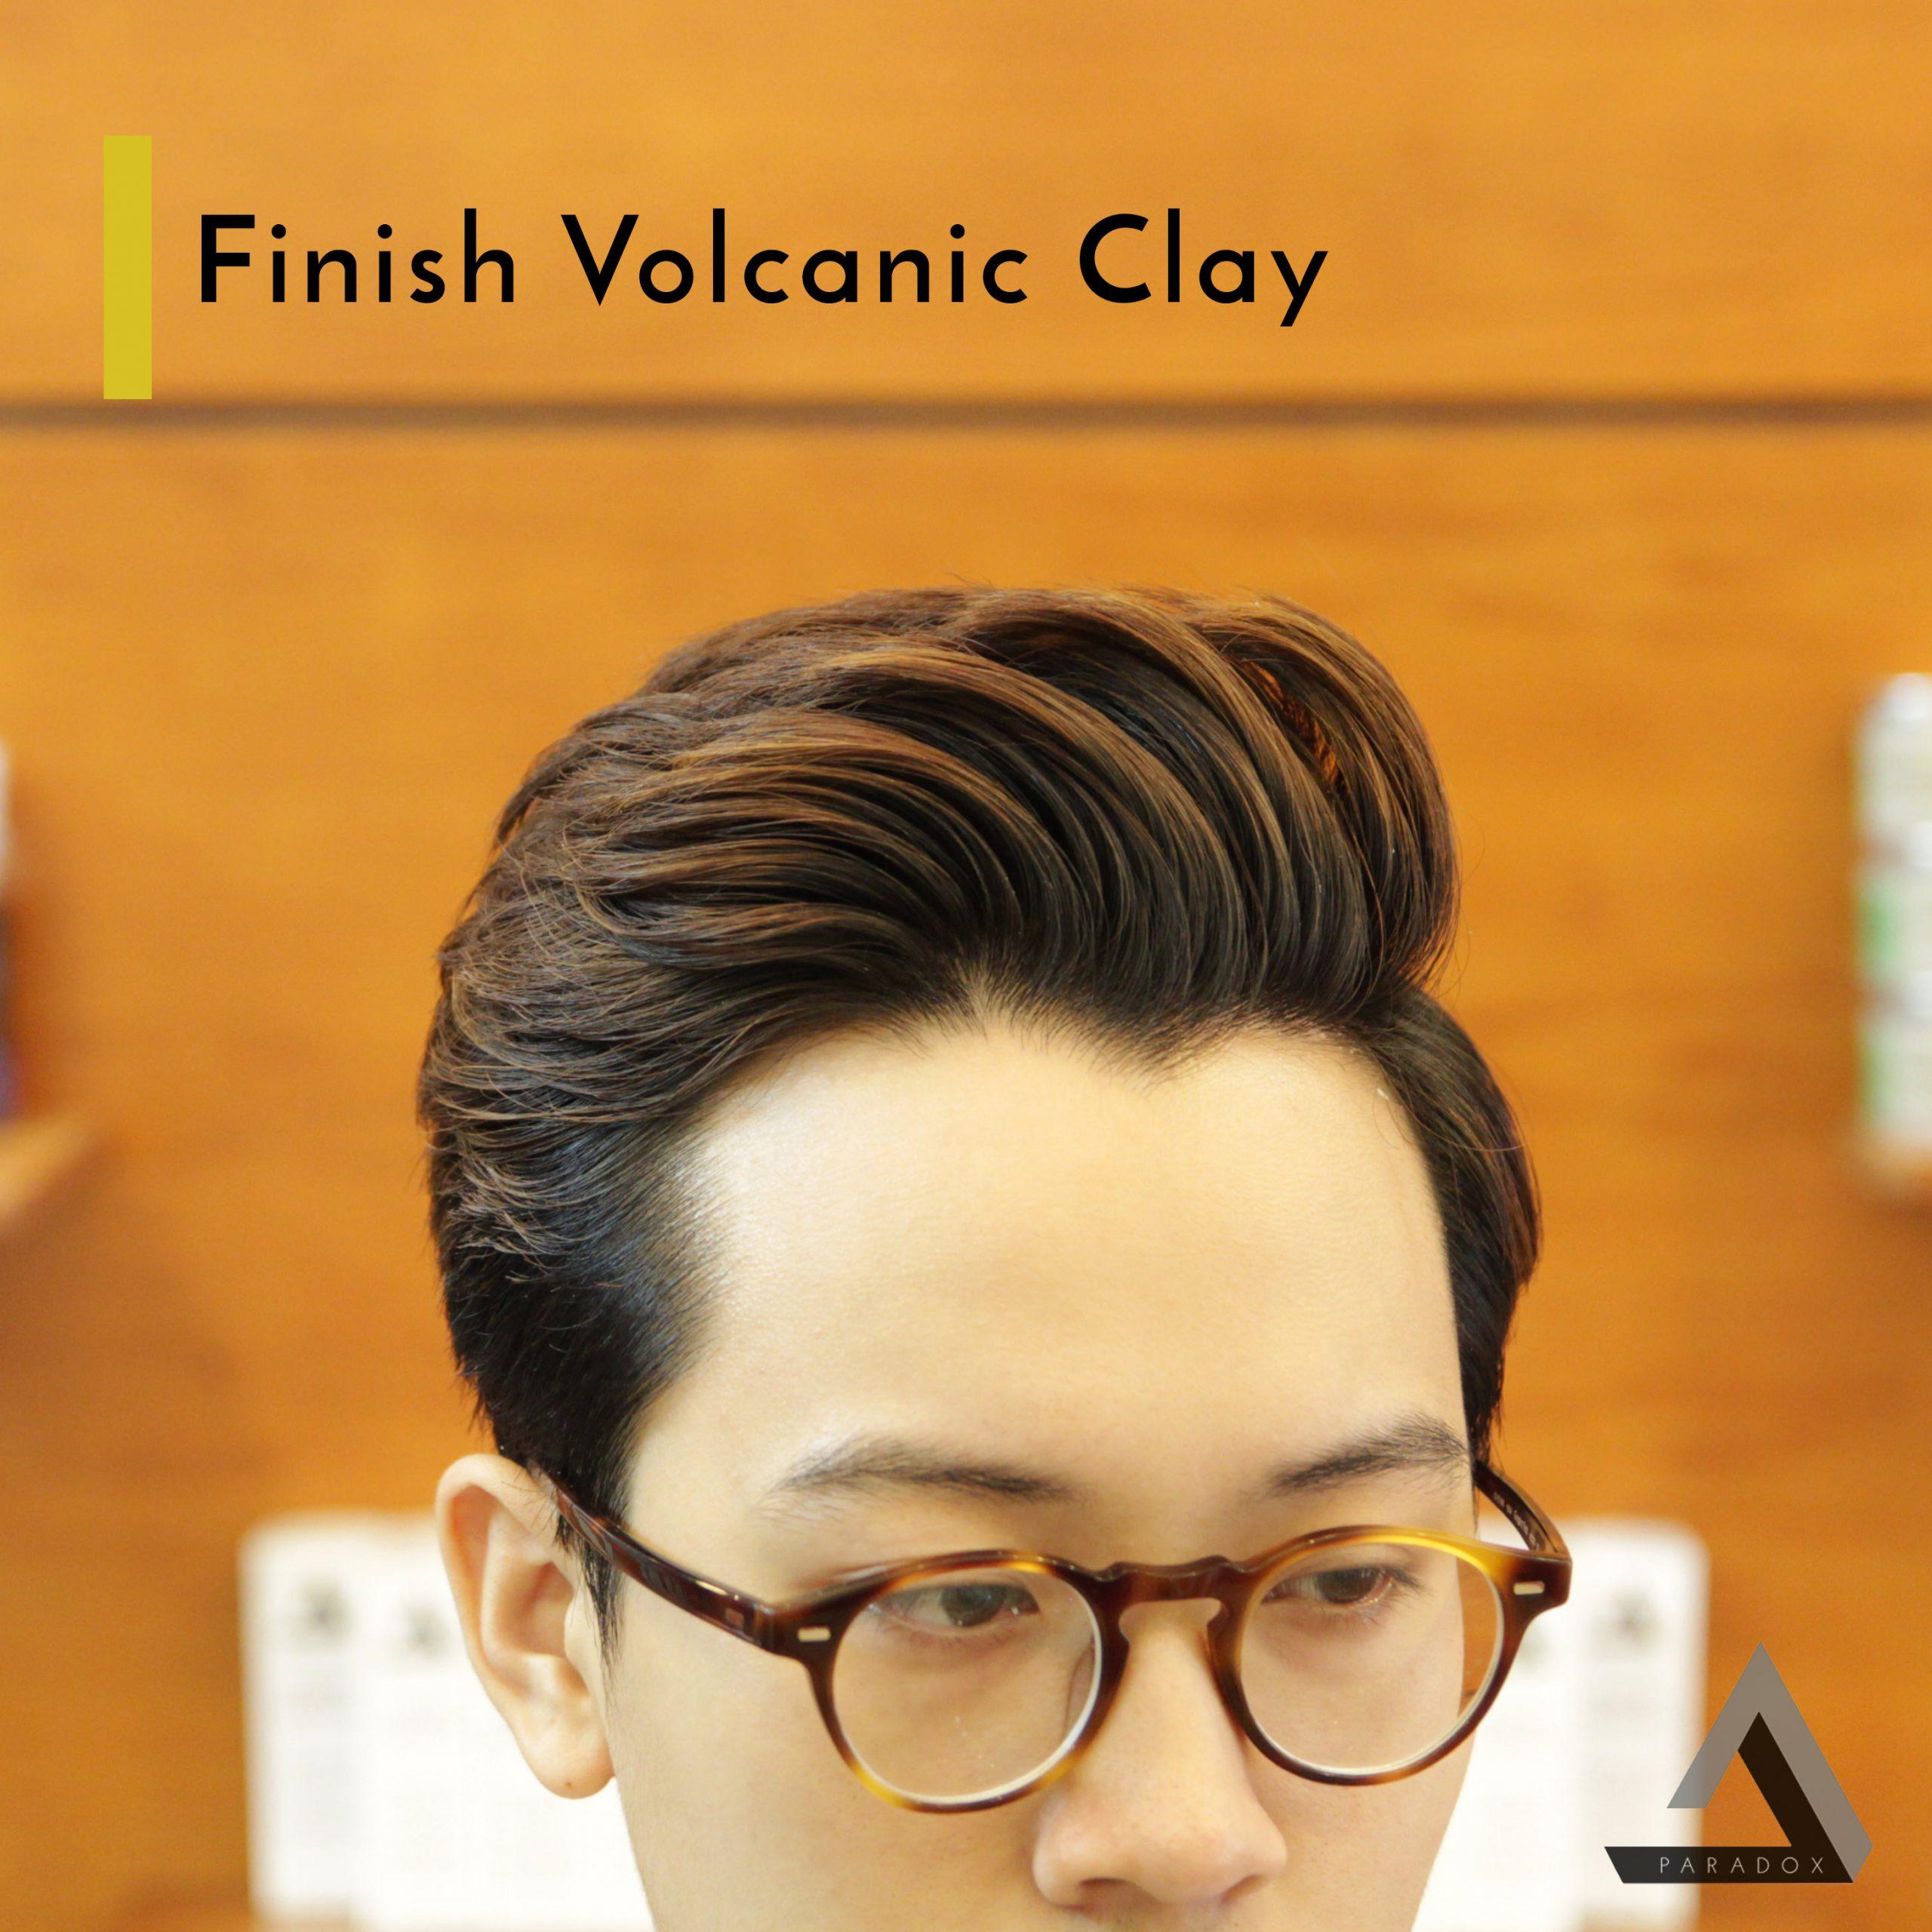 Finish Volcanic Clay